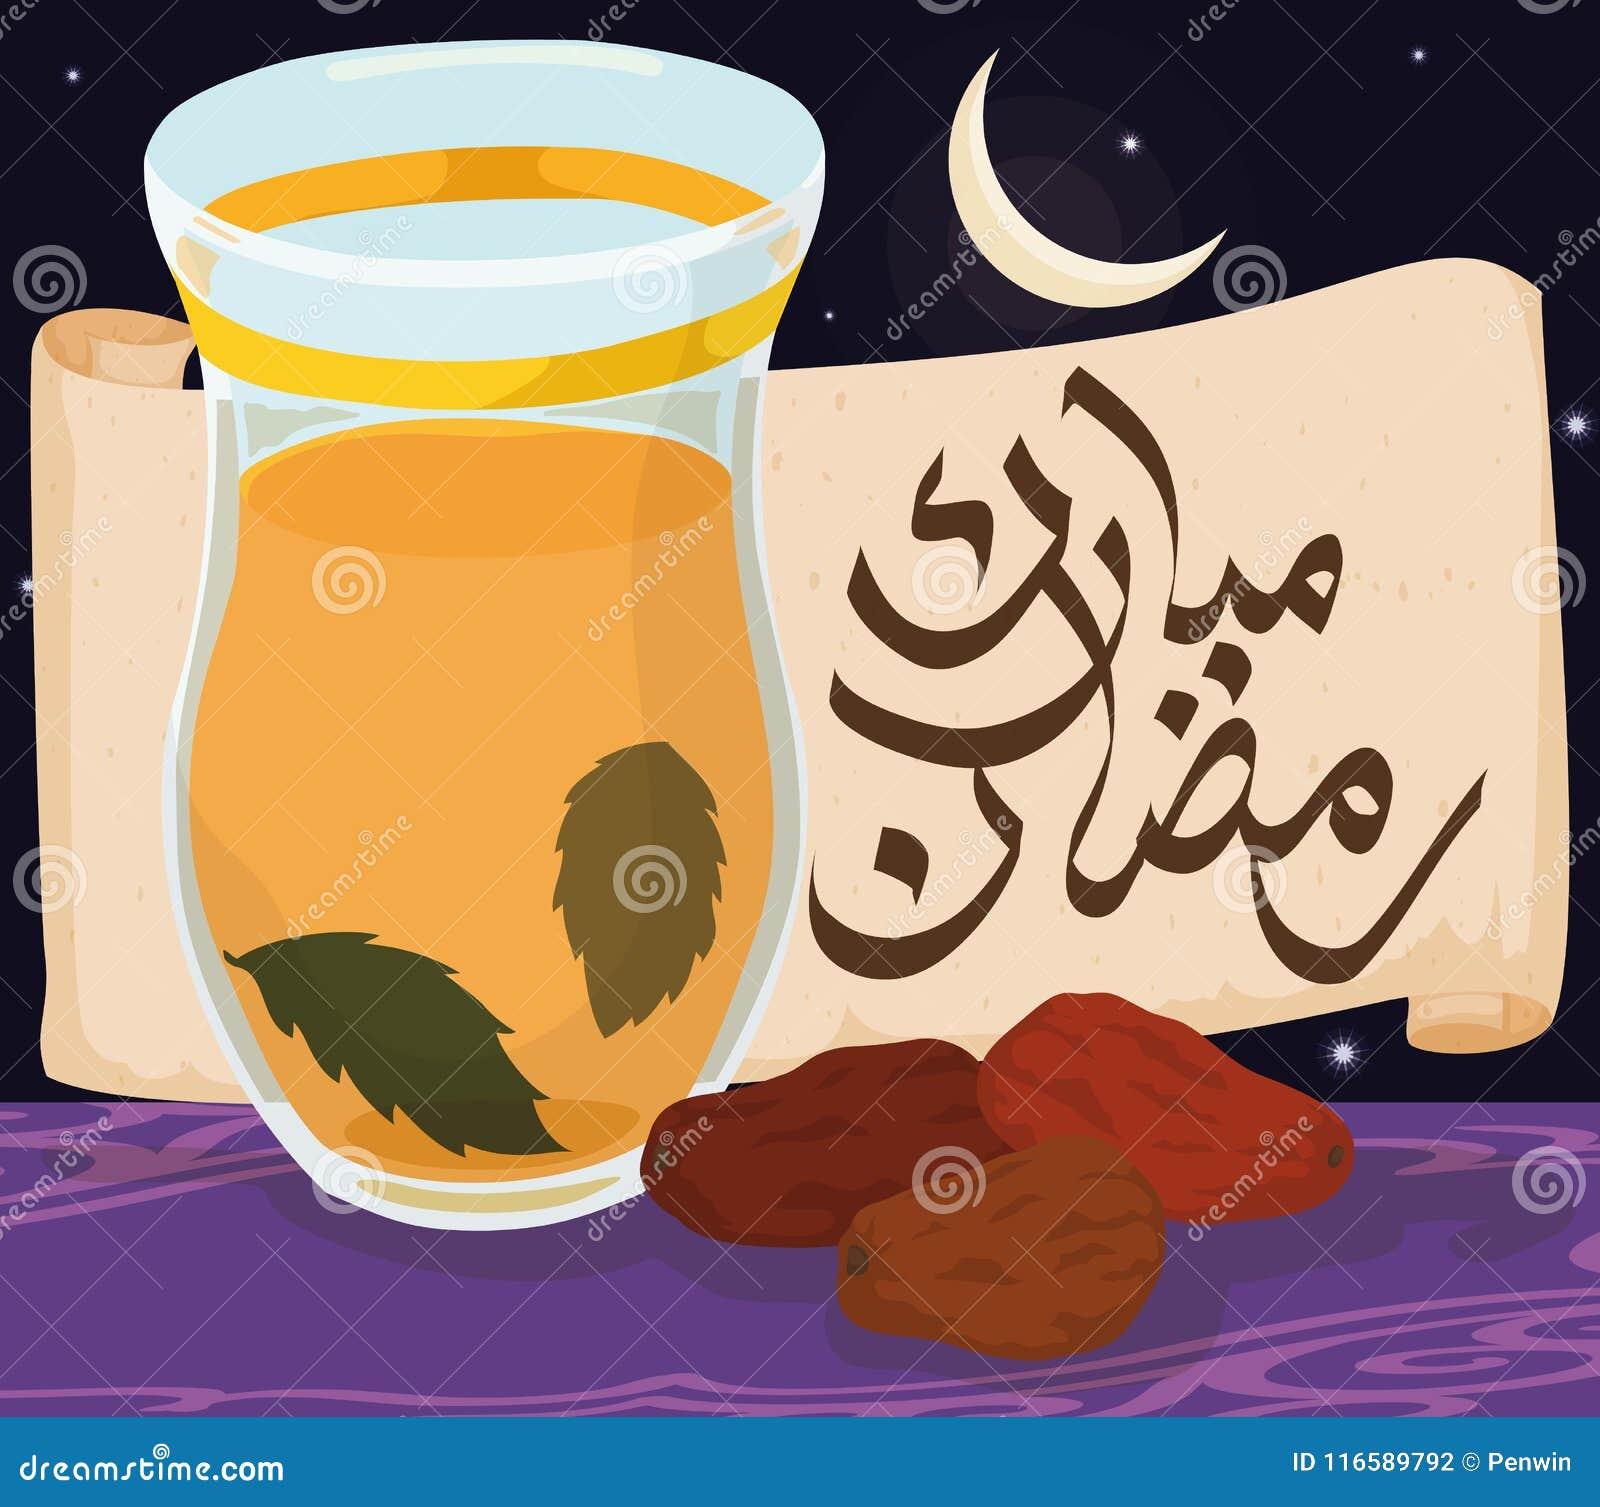 Ramadan Night With Arabic Tea Dates And Scroll For Iftar Vector